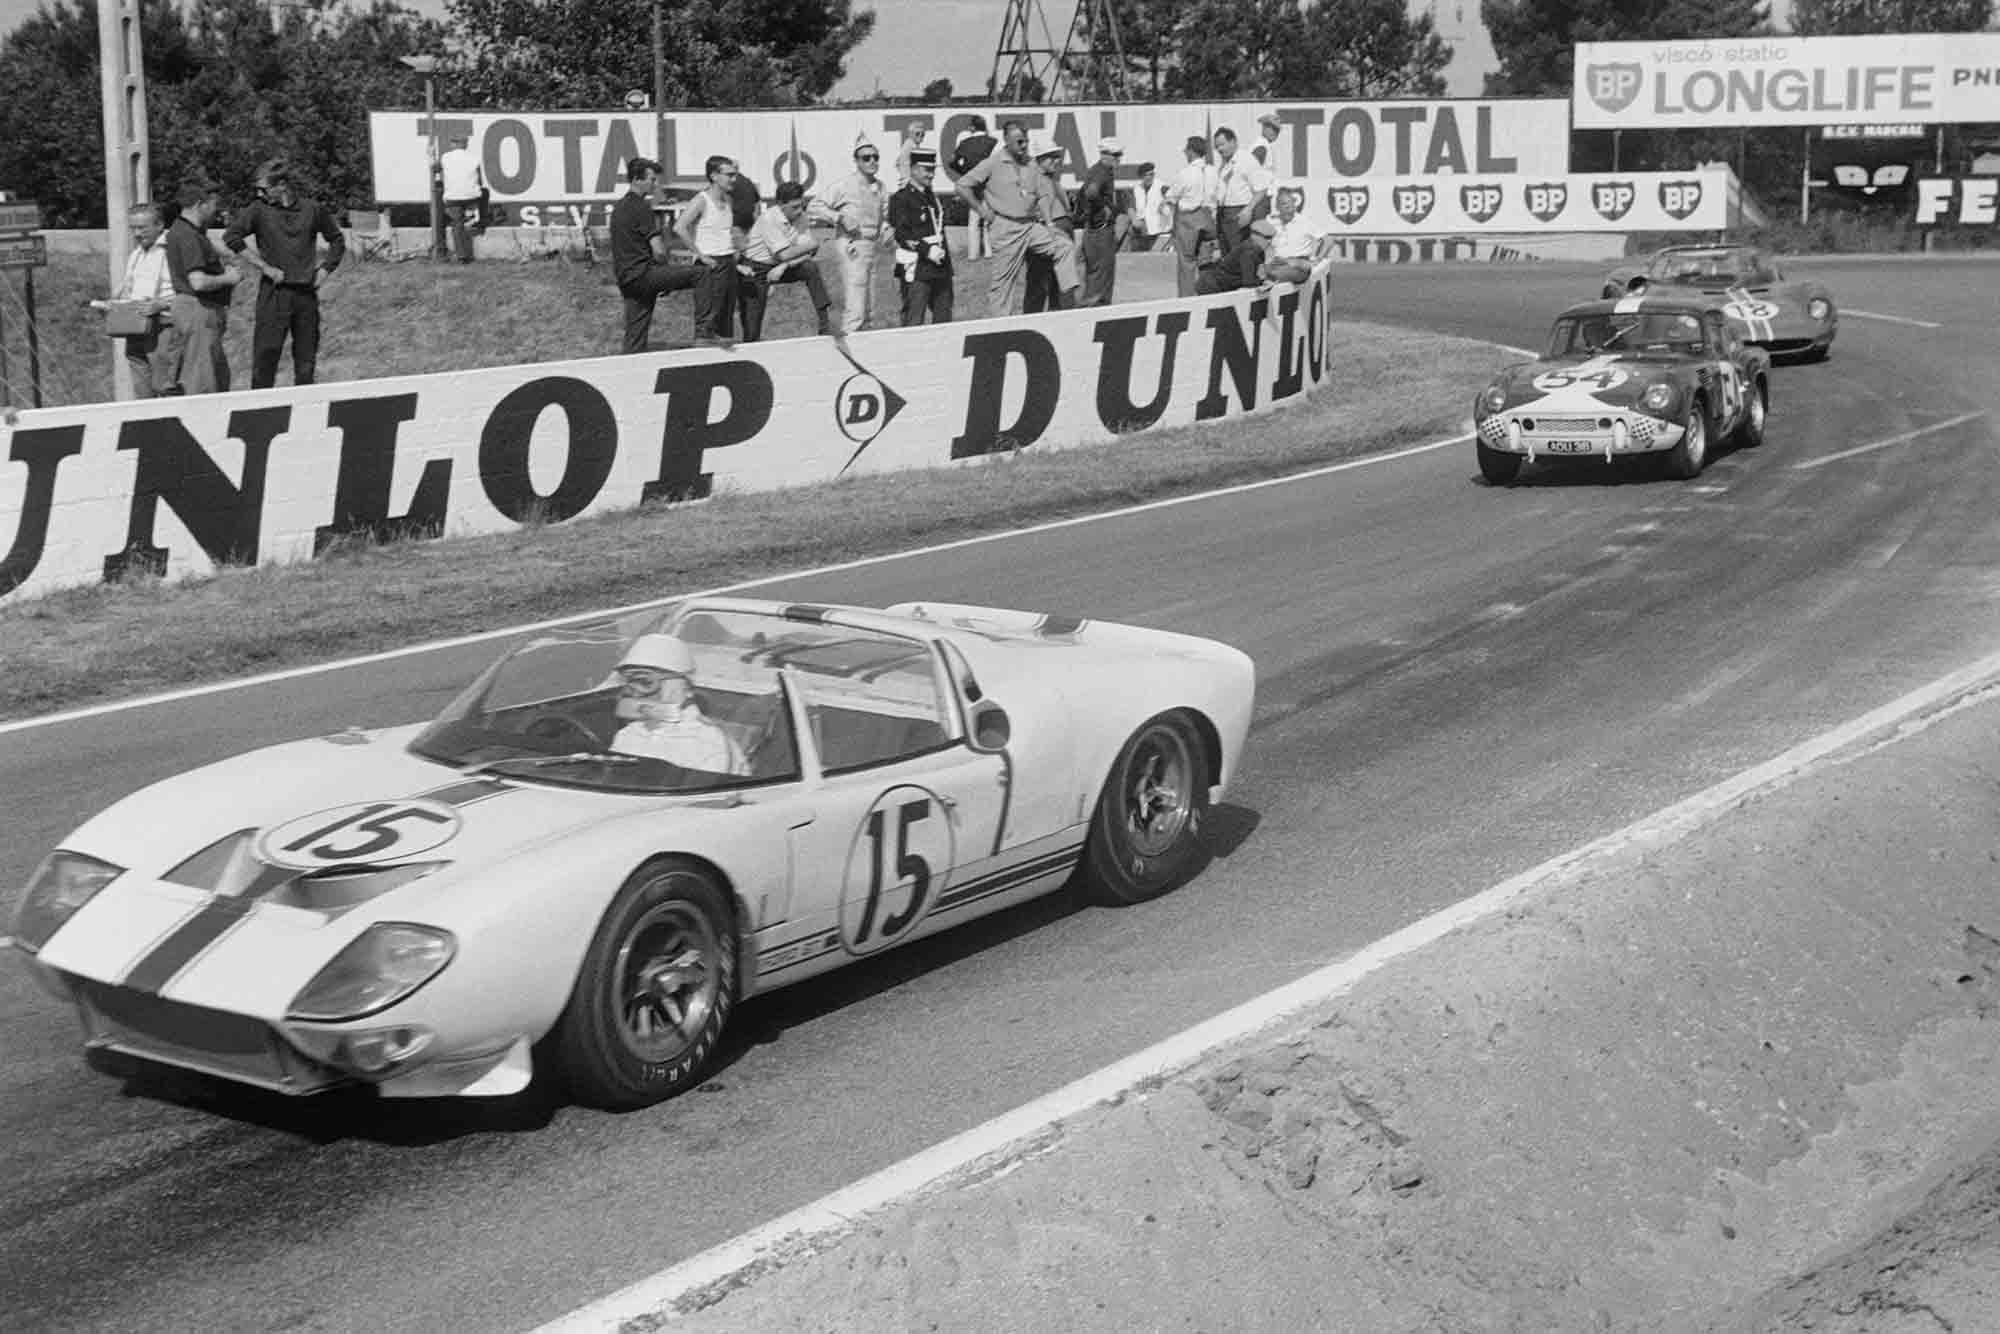 Maurice Trintignant / Guy Ligier, Ford France S.A, Ford GT40 Roadster, leads Claude Dubois / Jean-François Piot, Standard-Triumph Ltd, Triumph Spitfire, and Pedro Rodríguez / Nino Vaccarella, North American Racing Team, Ferrari 365 P1/P2 Spyder at le Mans 1965